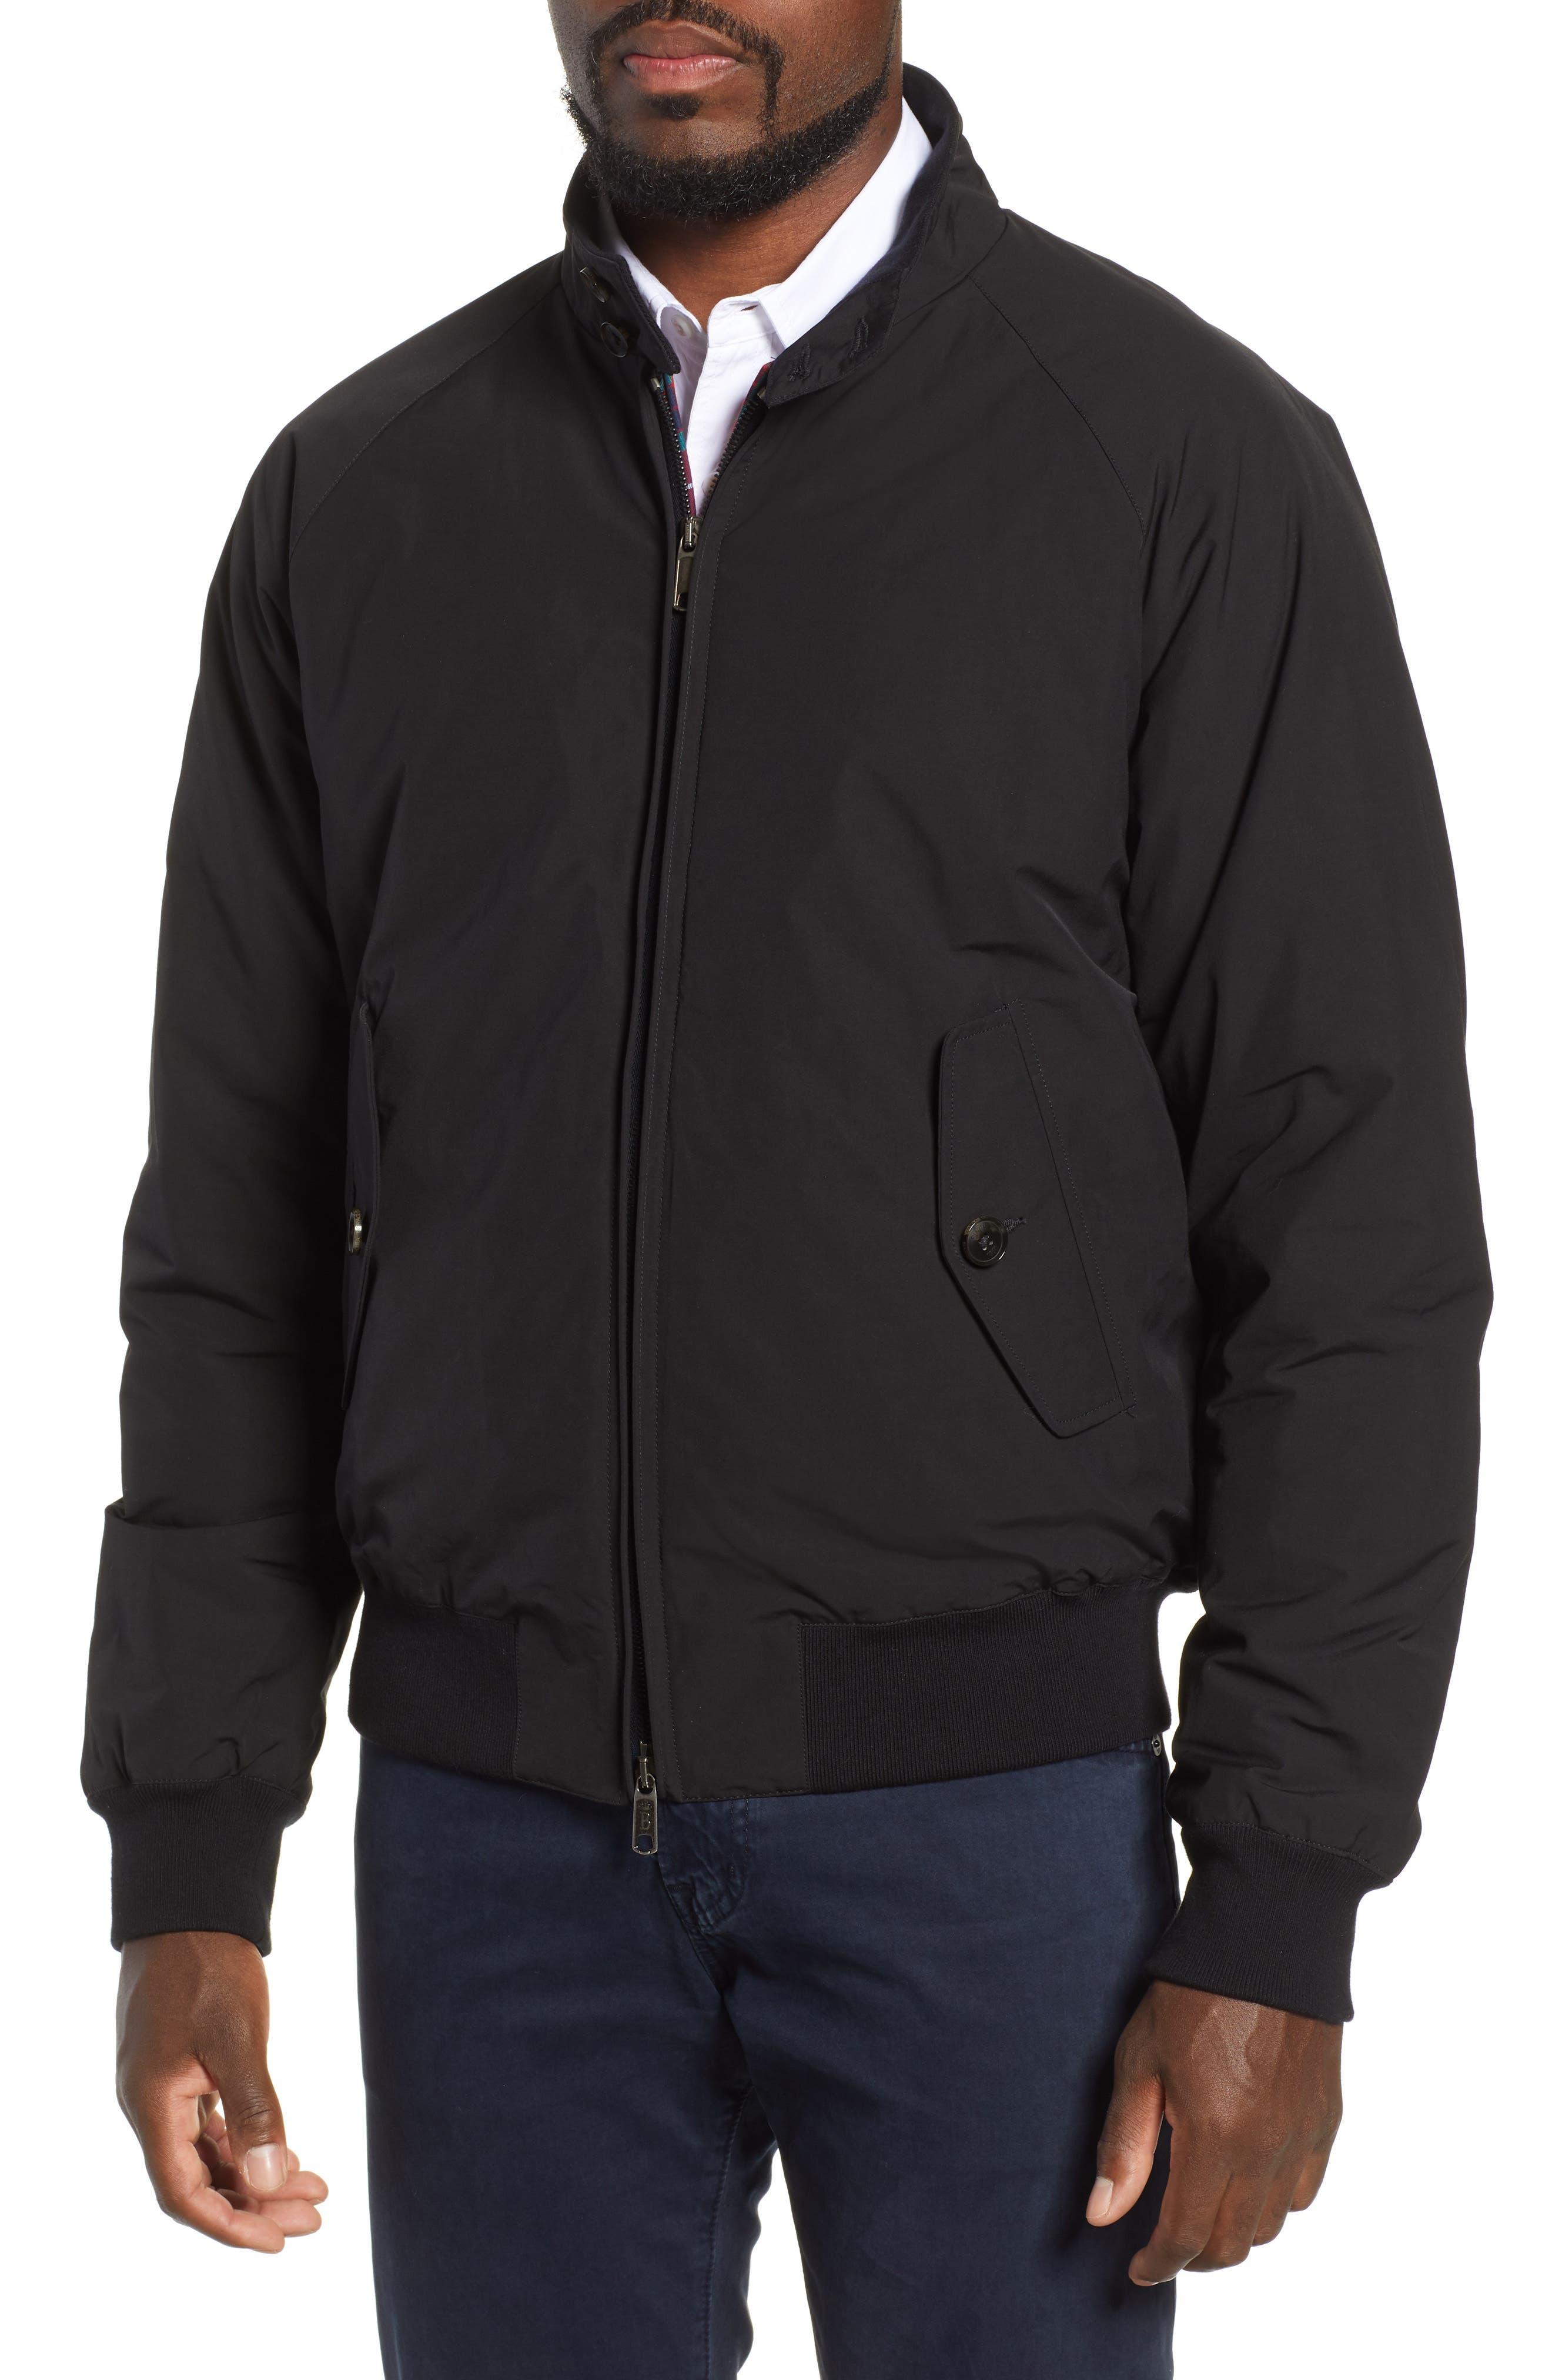 G9 Water Resistant Harrington Jacket,                             Alternate thumbnail 4, color,                             BLACK